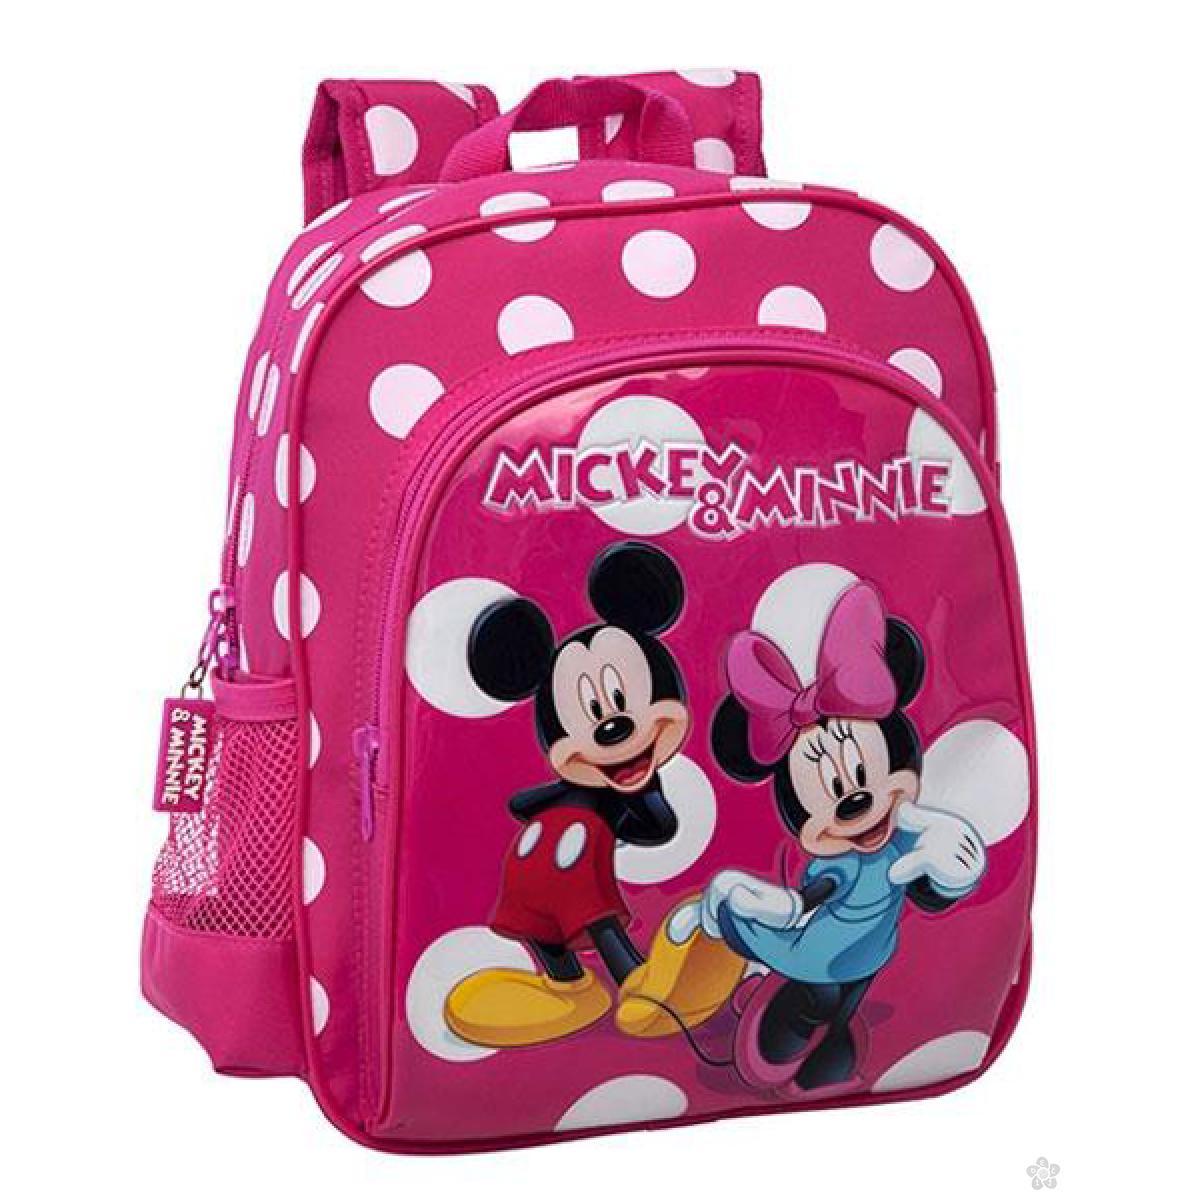 Ranac za vrtić Minnie & Mickey 20.721.51